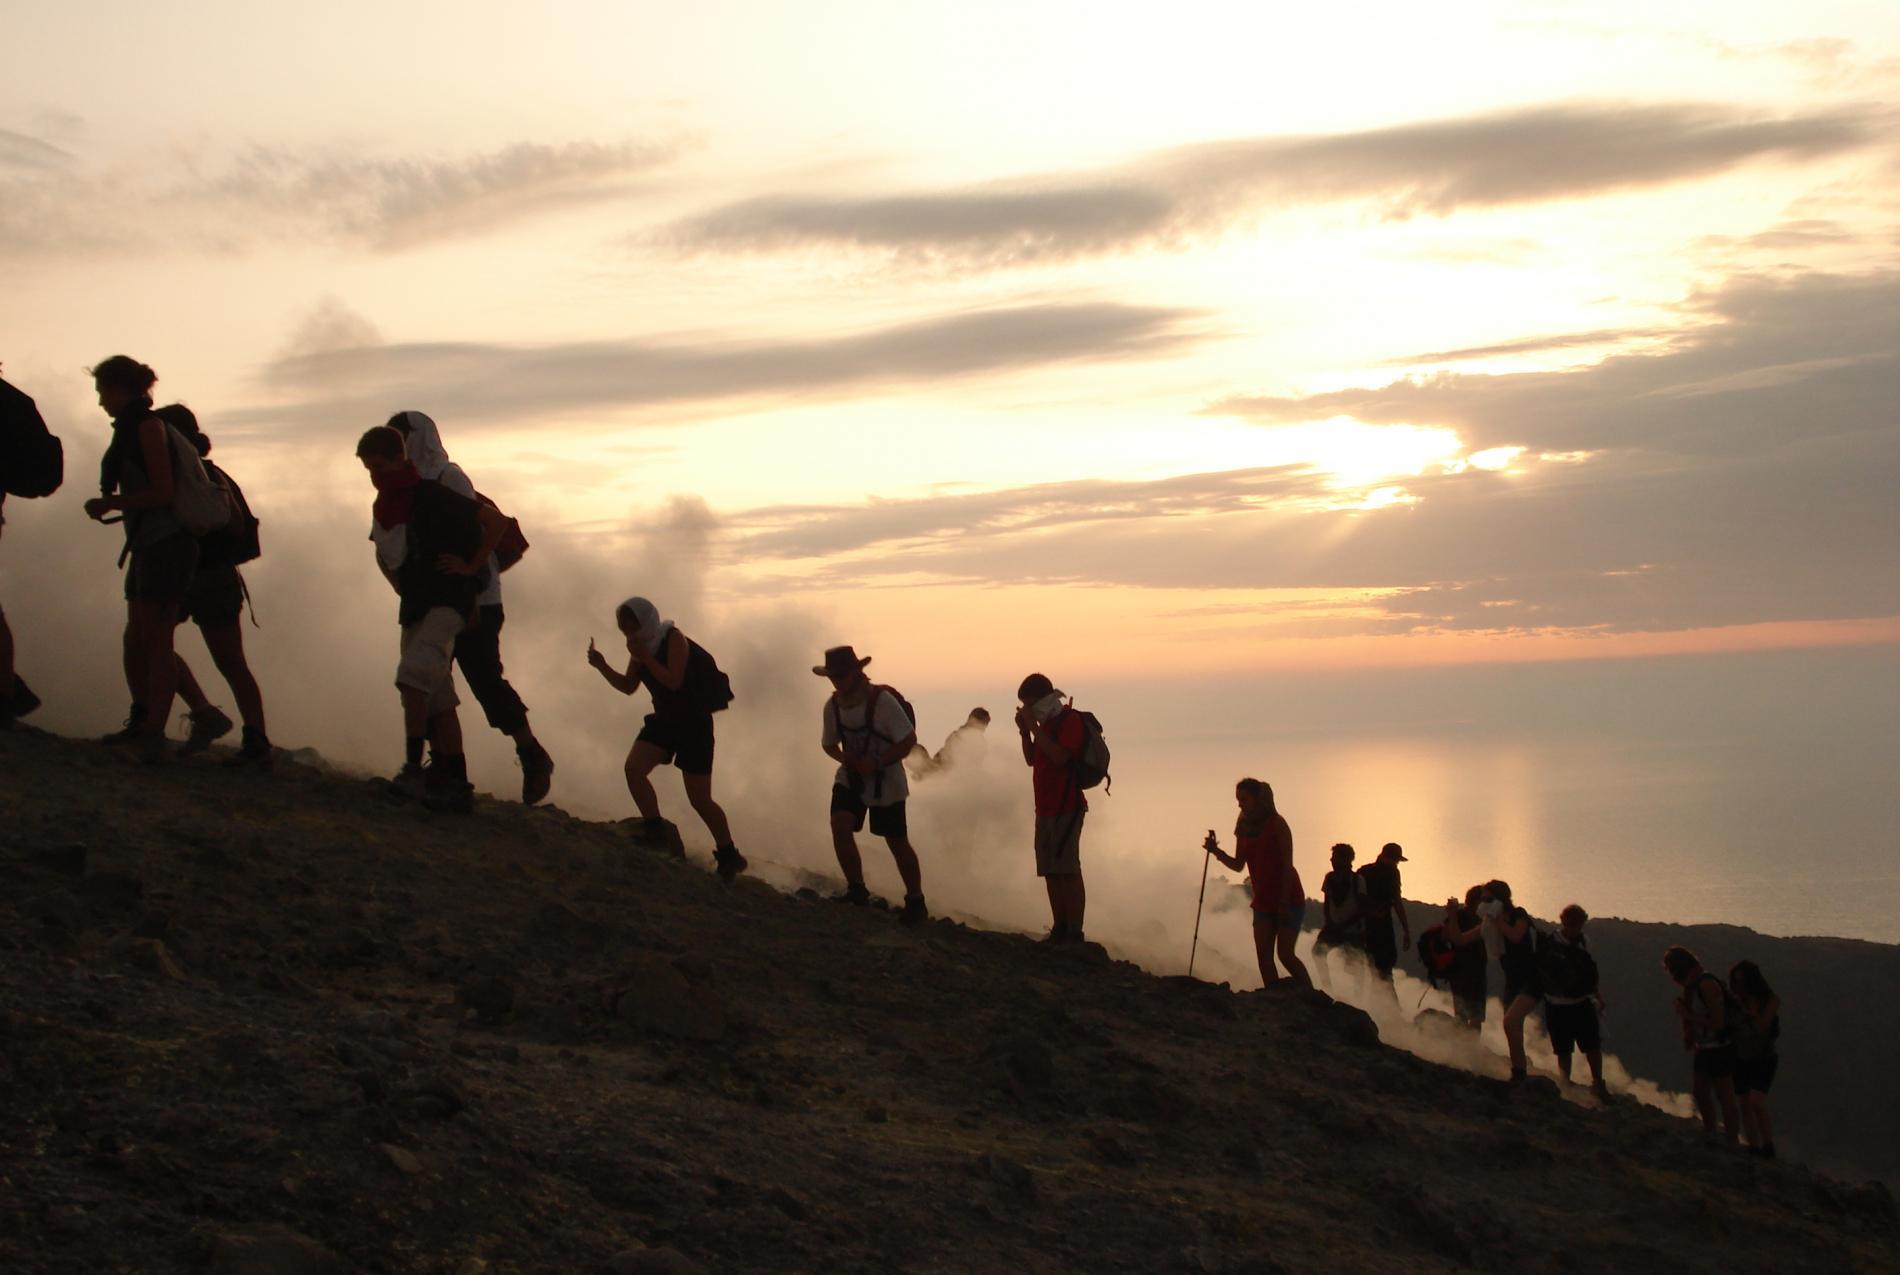 Voyage solidaire Italie : Vision du Monde - Photo 8